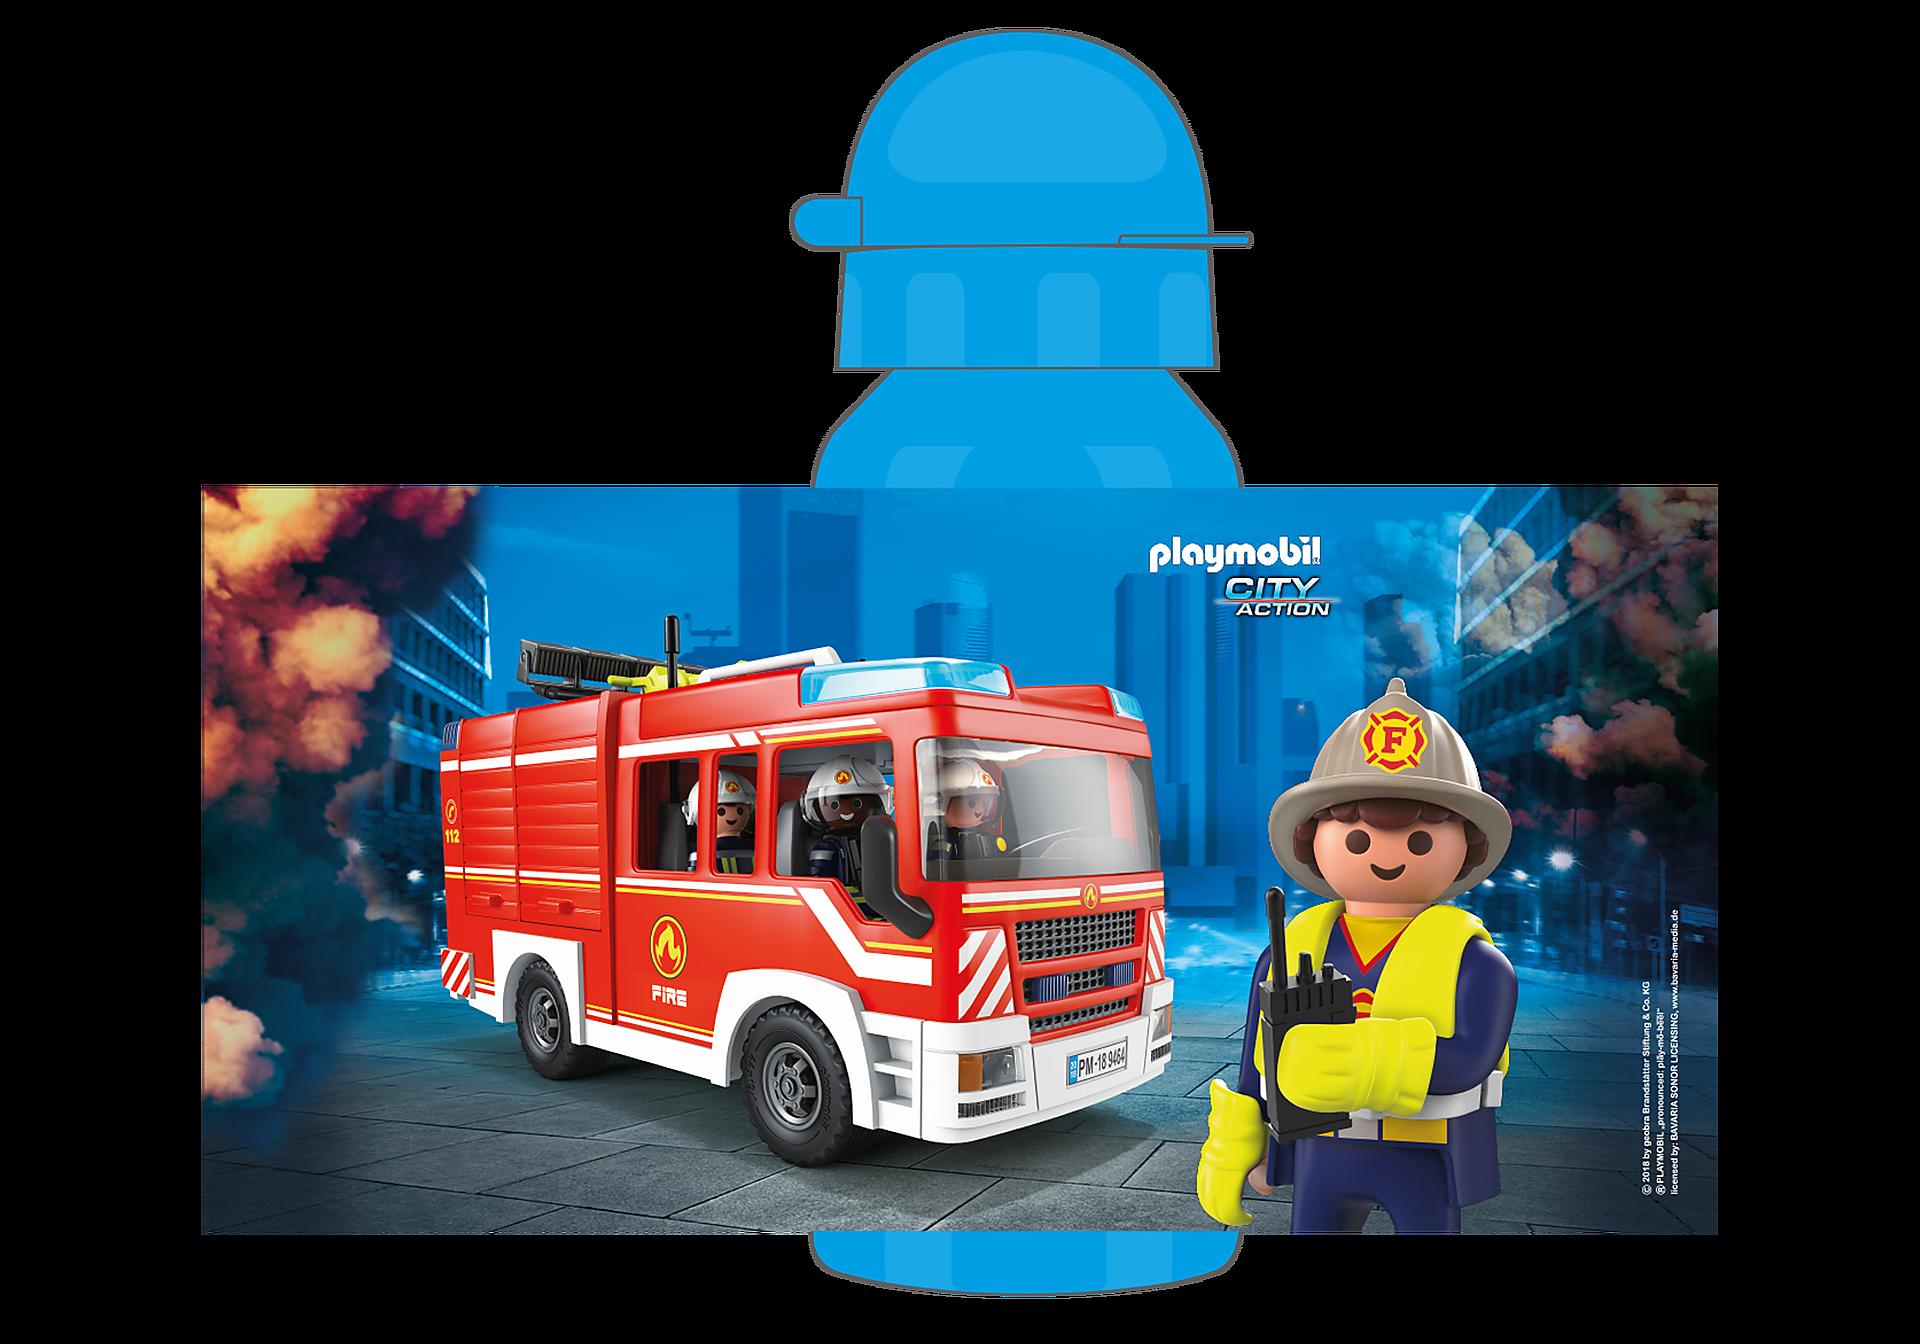 http://media.playmobil.com/i/playmobil/80494_product_detail/Playmobil Flasche Feuerwehr